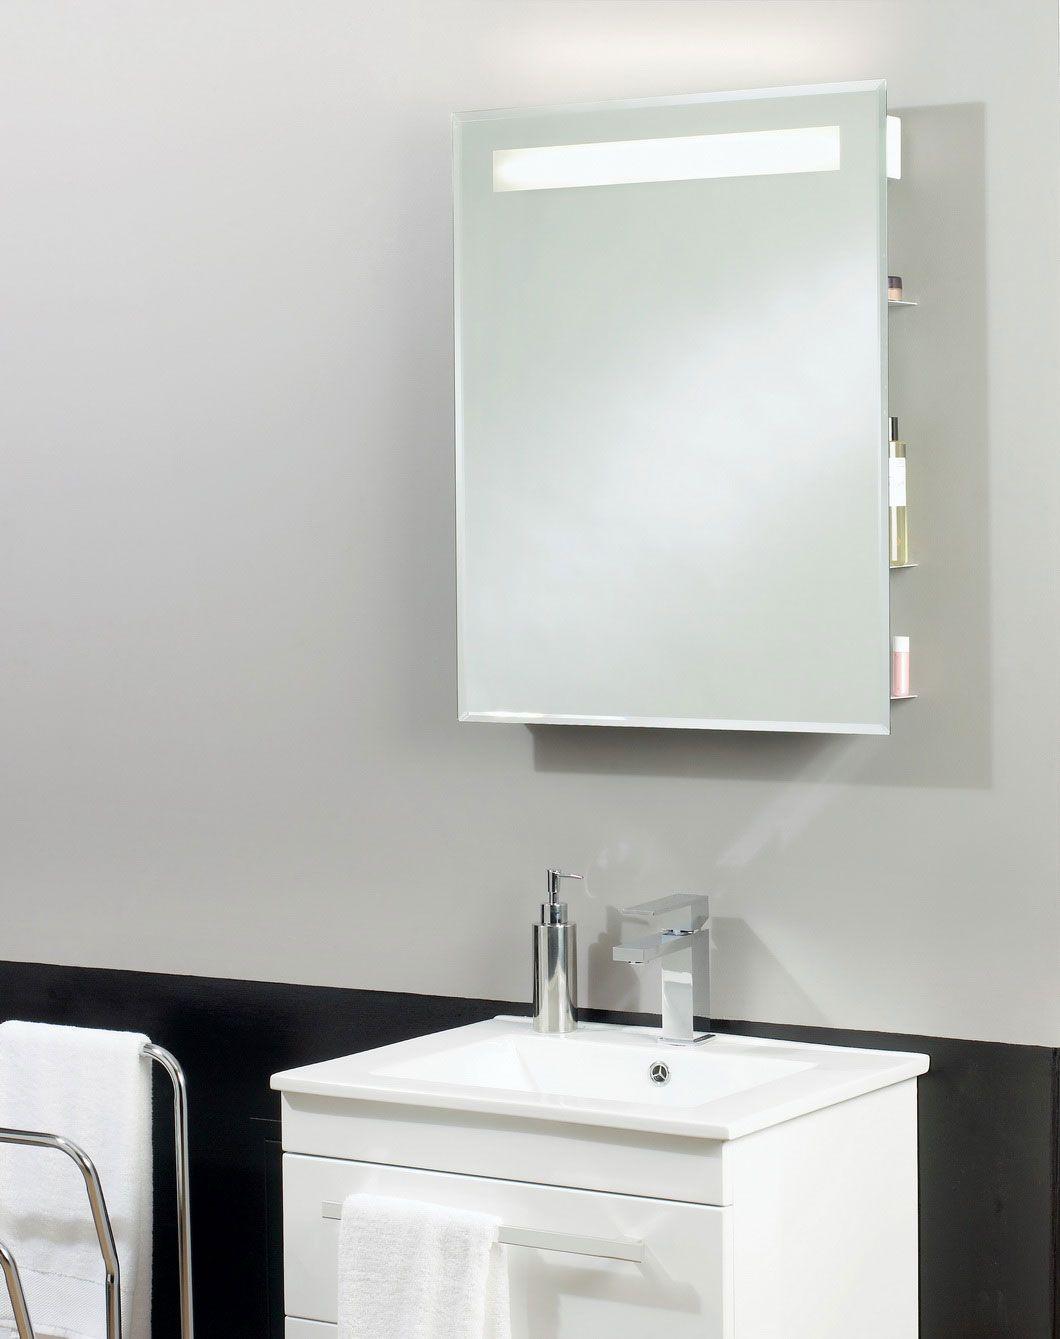 Bathroom Mirror Designs Brilliant 25 Best Bathroom Mirror Ideas For A Small Bathroom  Bathroom 2018